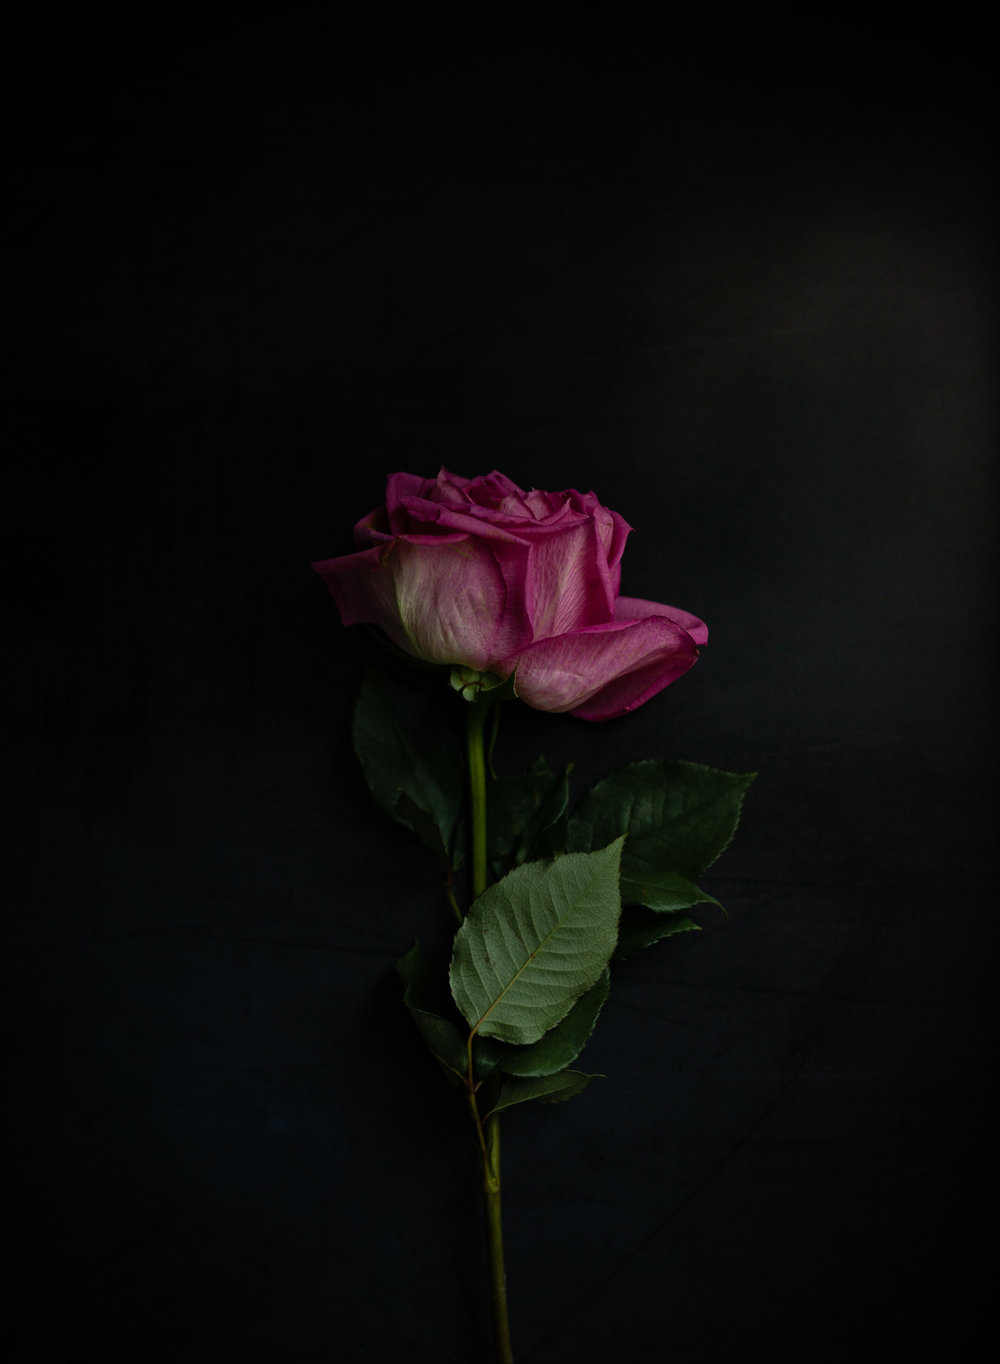 Roses30MINUTES-9.jpg